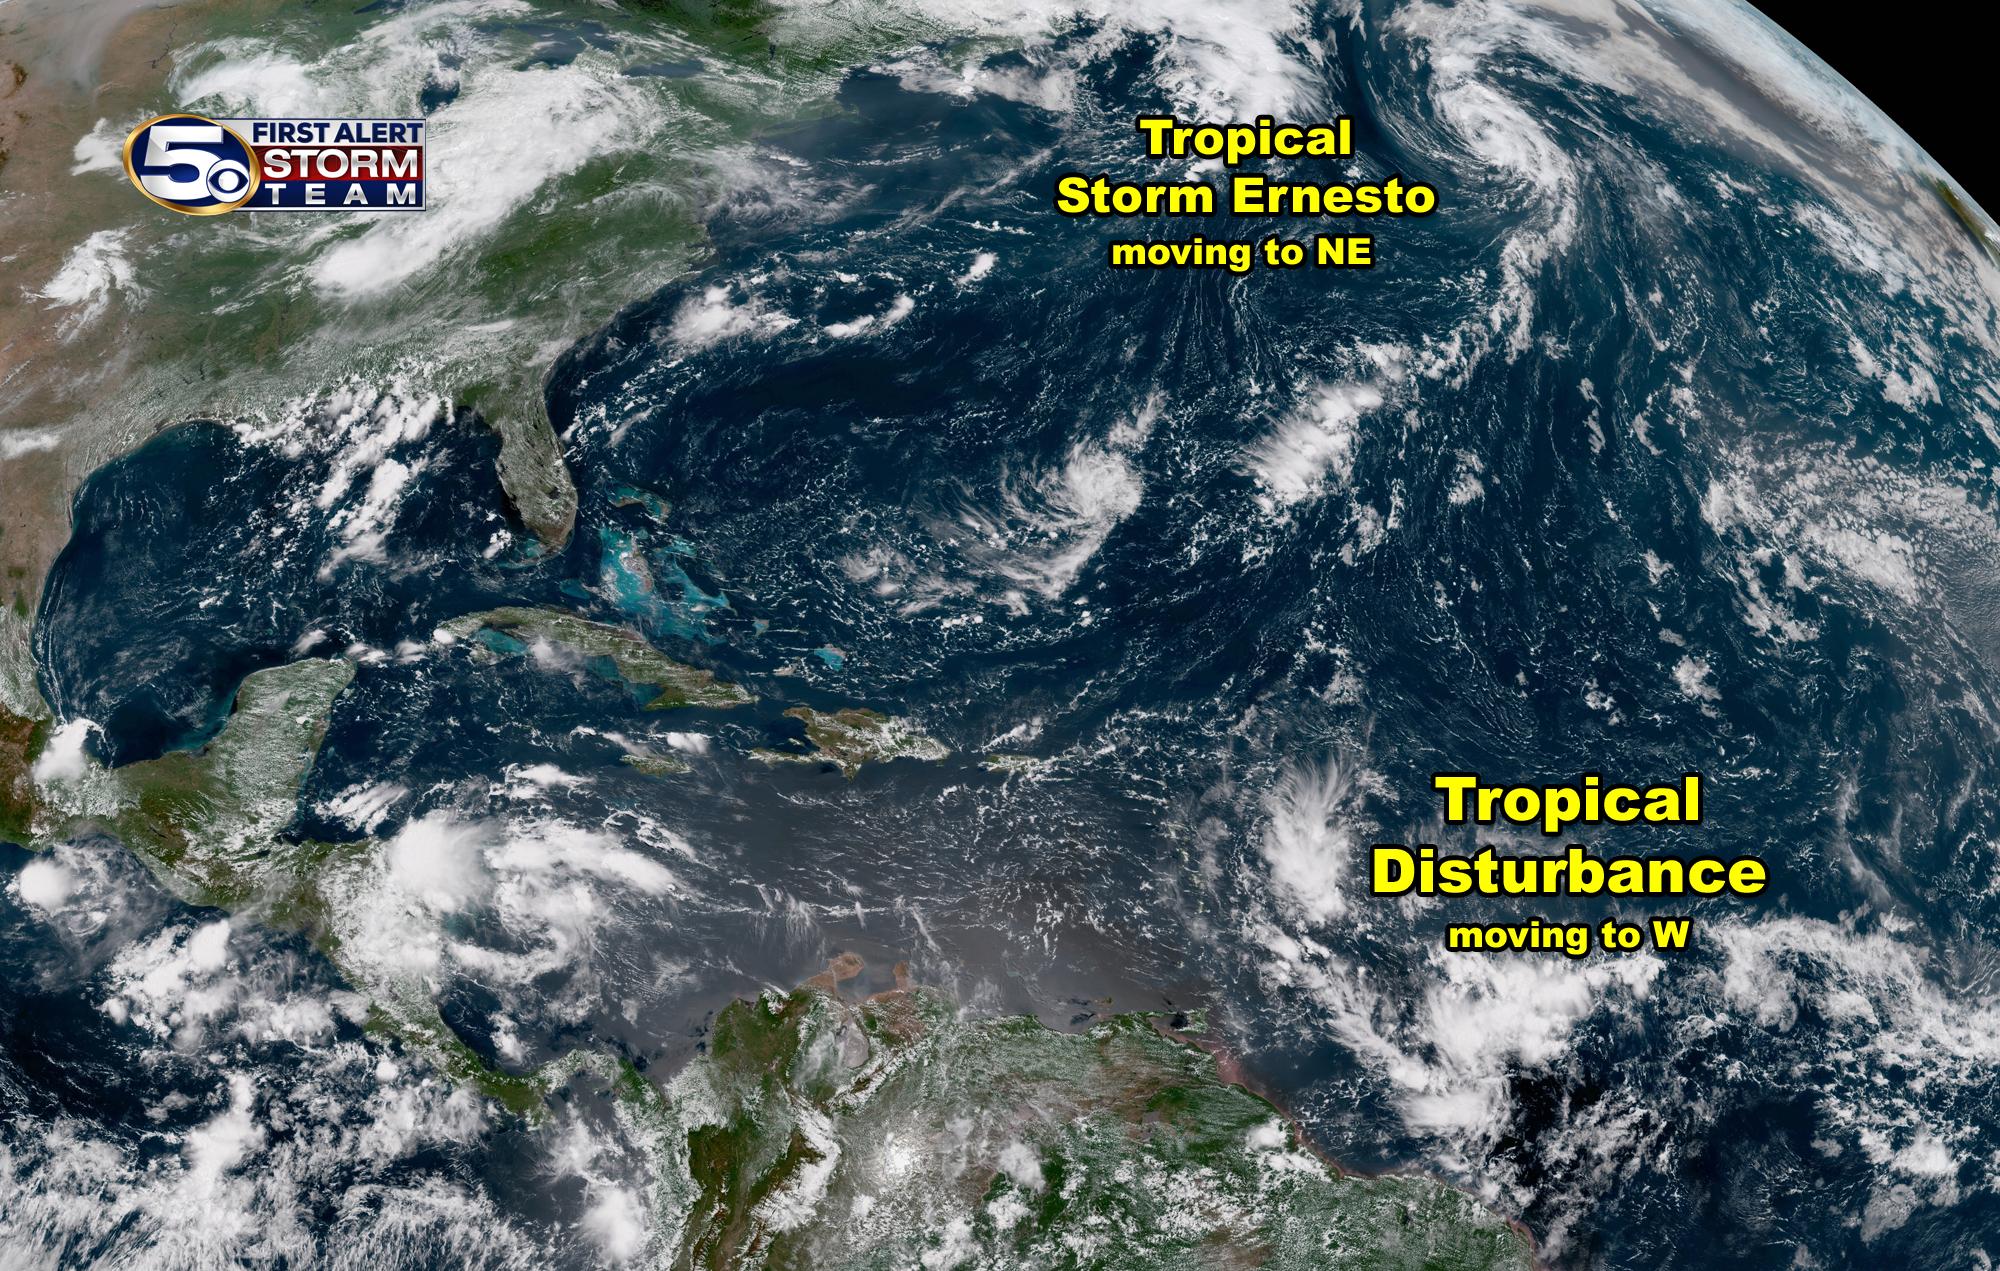 Tropical Disturbance satellite